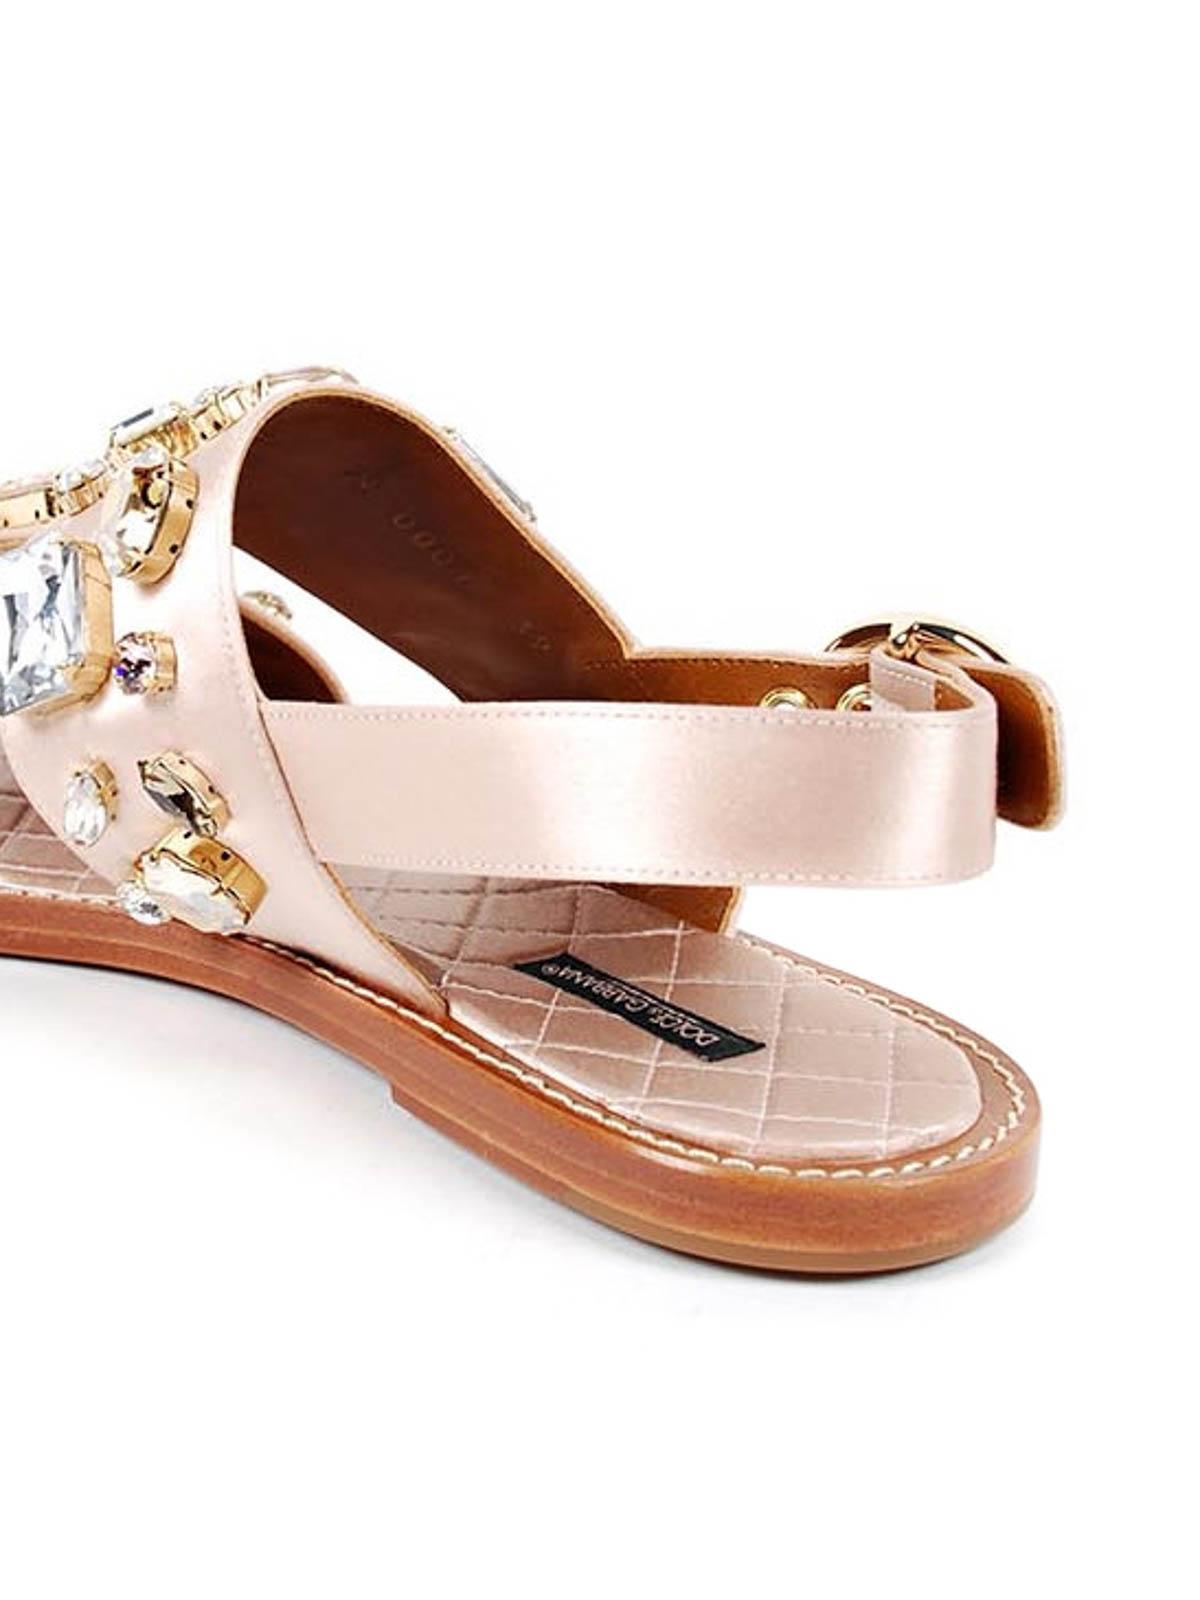 460f0906b Dolce   Gabbana - Satin sandals with gems - sandals - CQ0001 A7630 80408